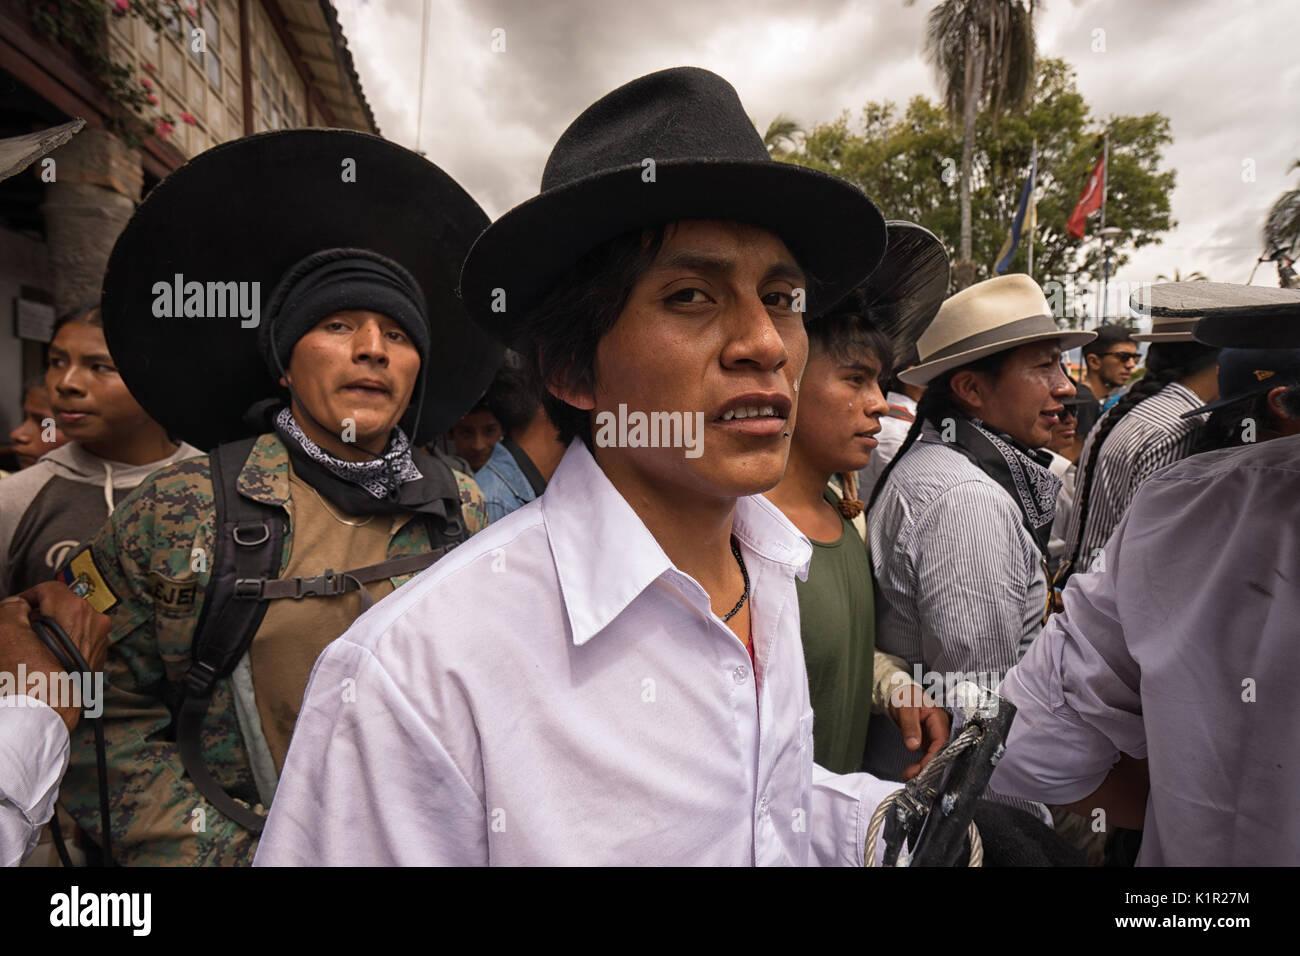 June 24, 2017 Cotacachi, Ecuador: closeup of indigenous kichwa men  participating in a parade at summer solstice - Stock Image